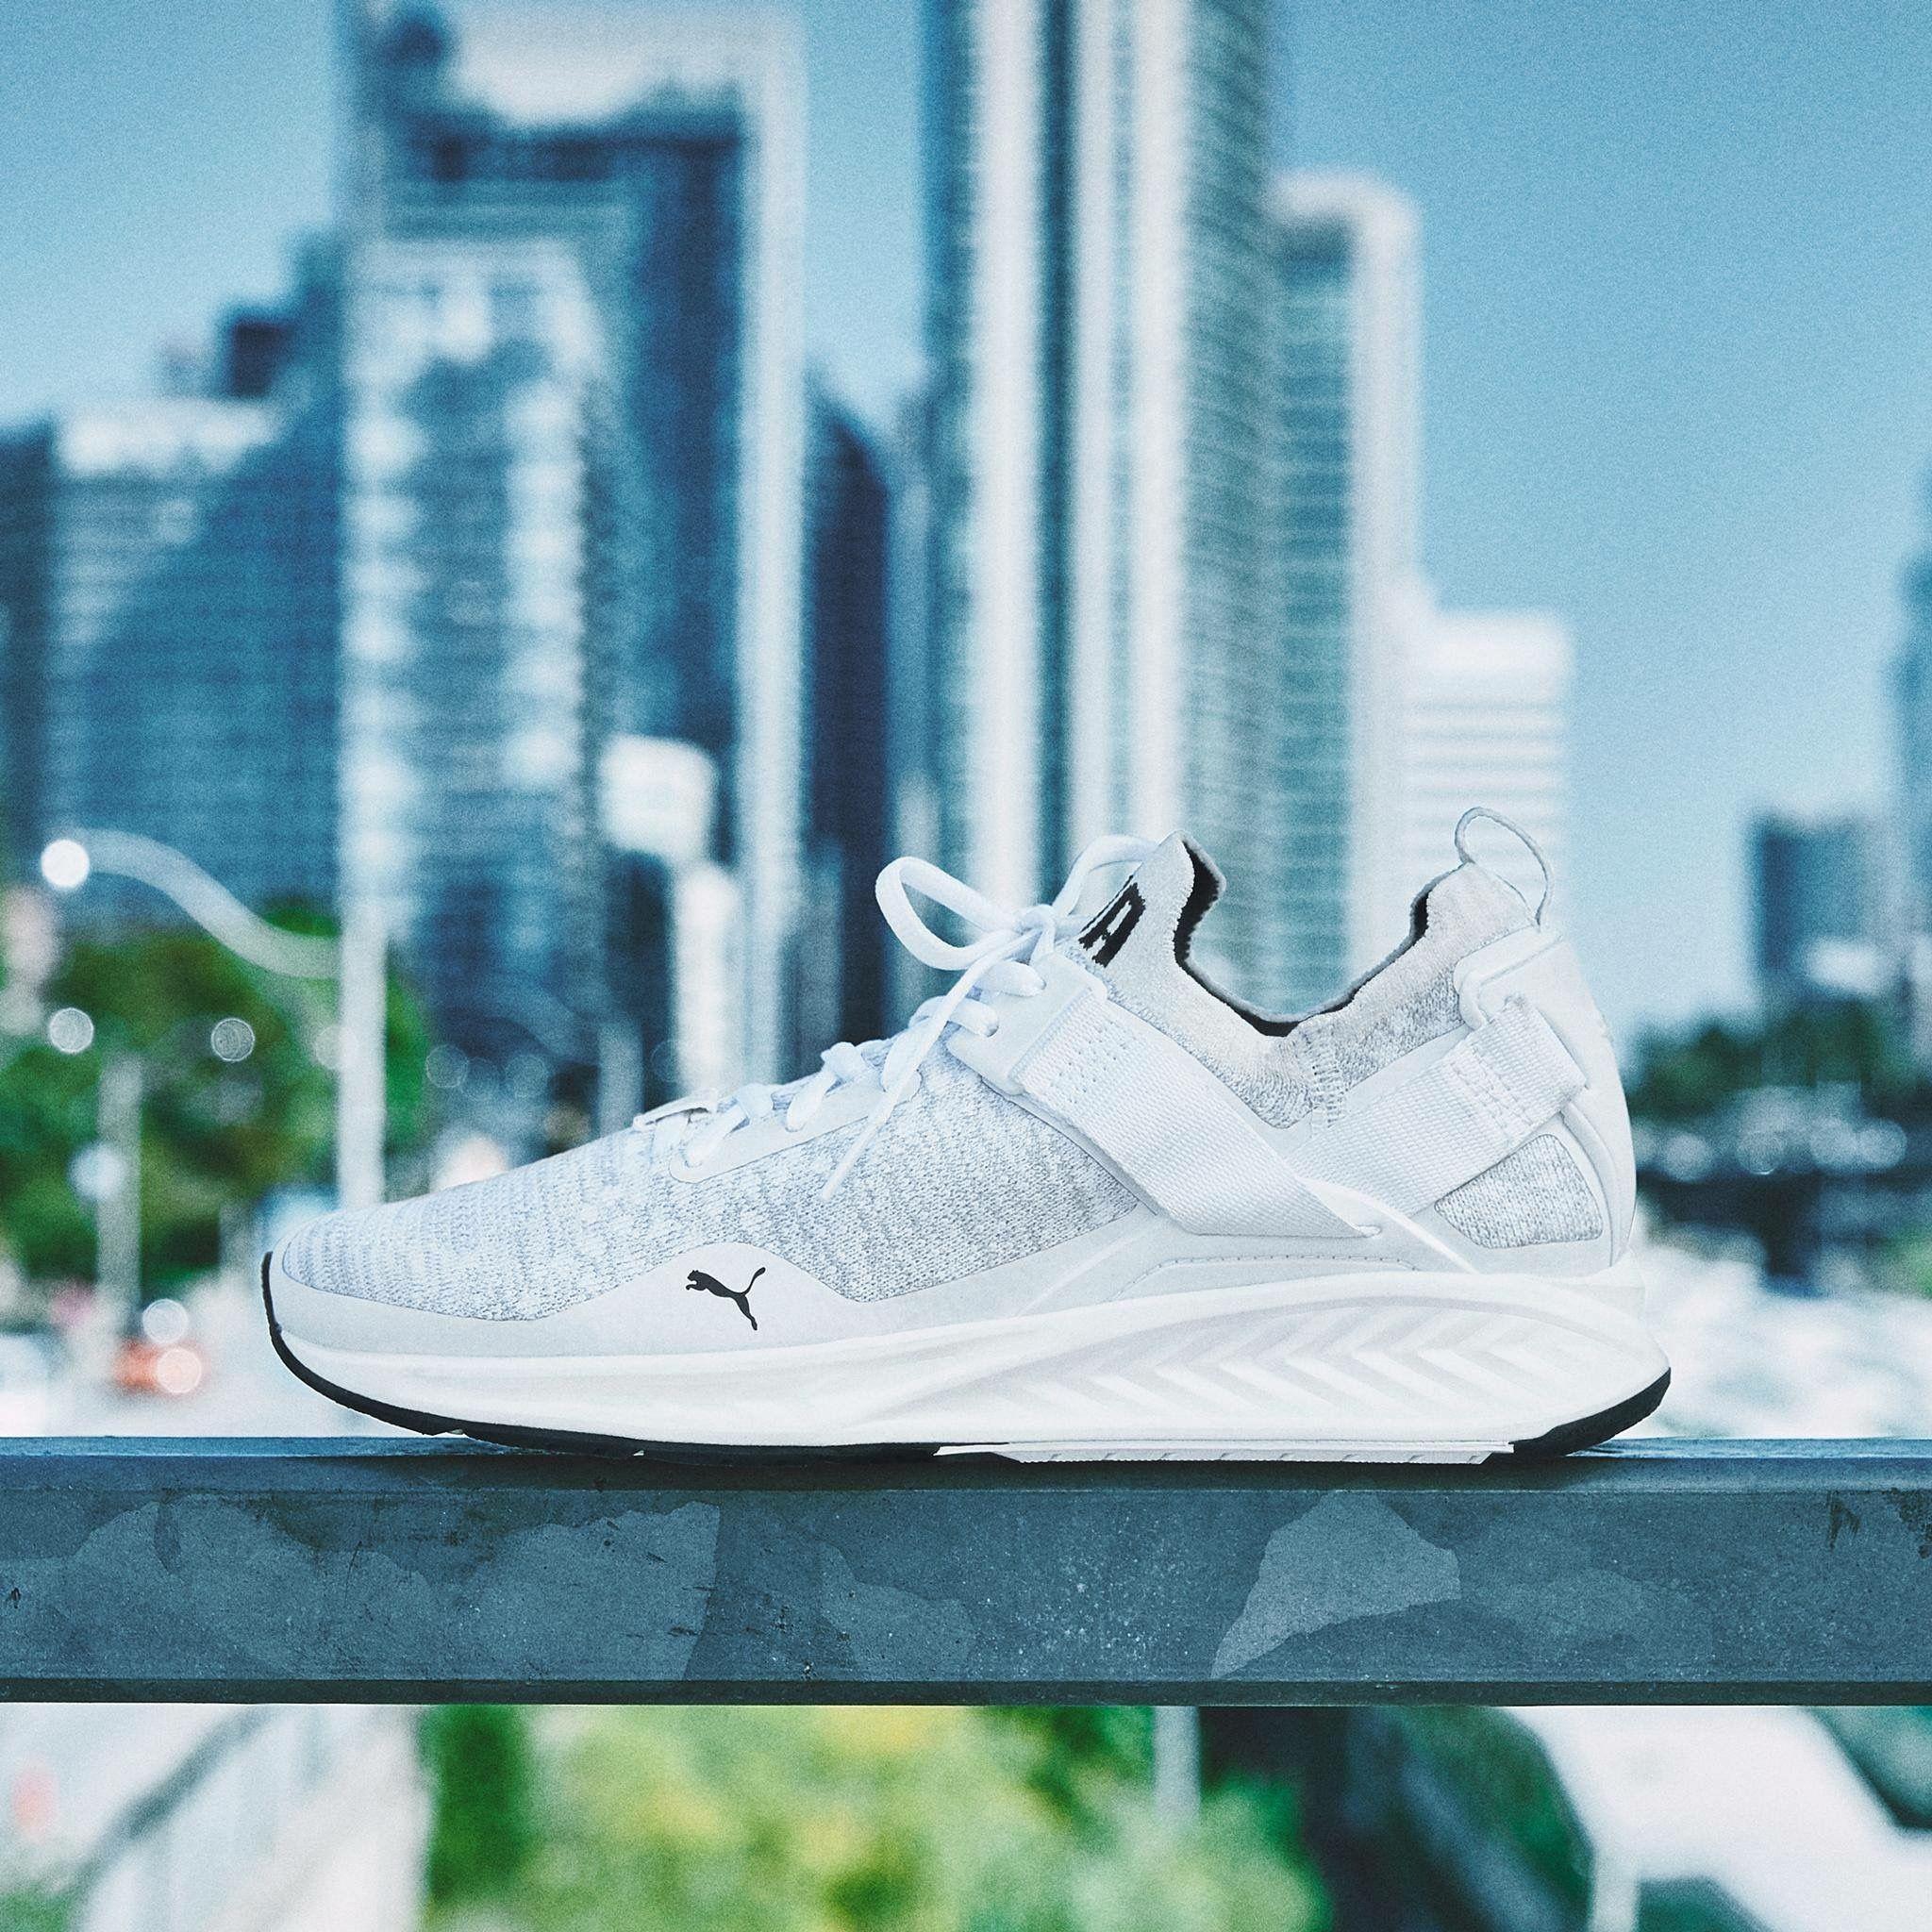 quality design 1eadd a4807 Puma Ignite EvoKNIT Lo Puma Sneakers Shoes, Pumas Shoes, Gym Gear, Training  Shoes